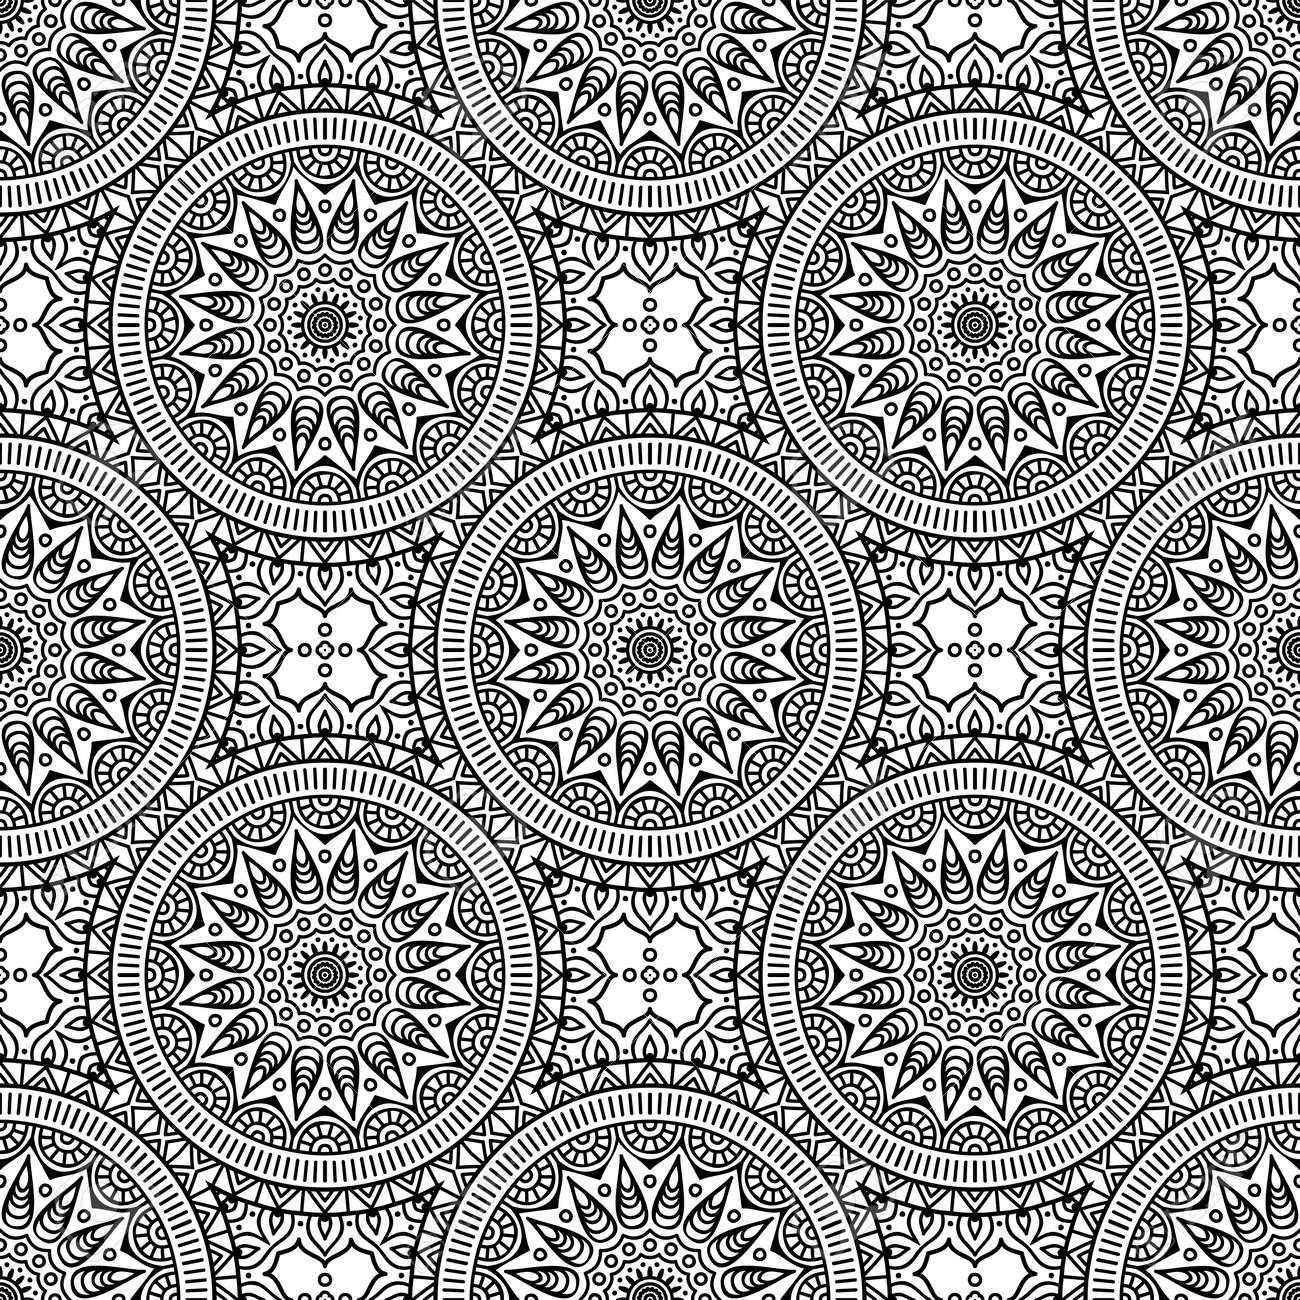 Seamless pattern. Vintage decorative elements - 152477254